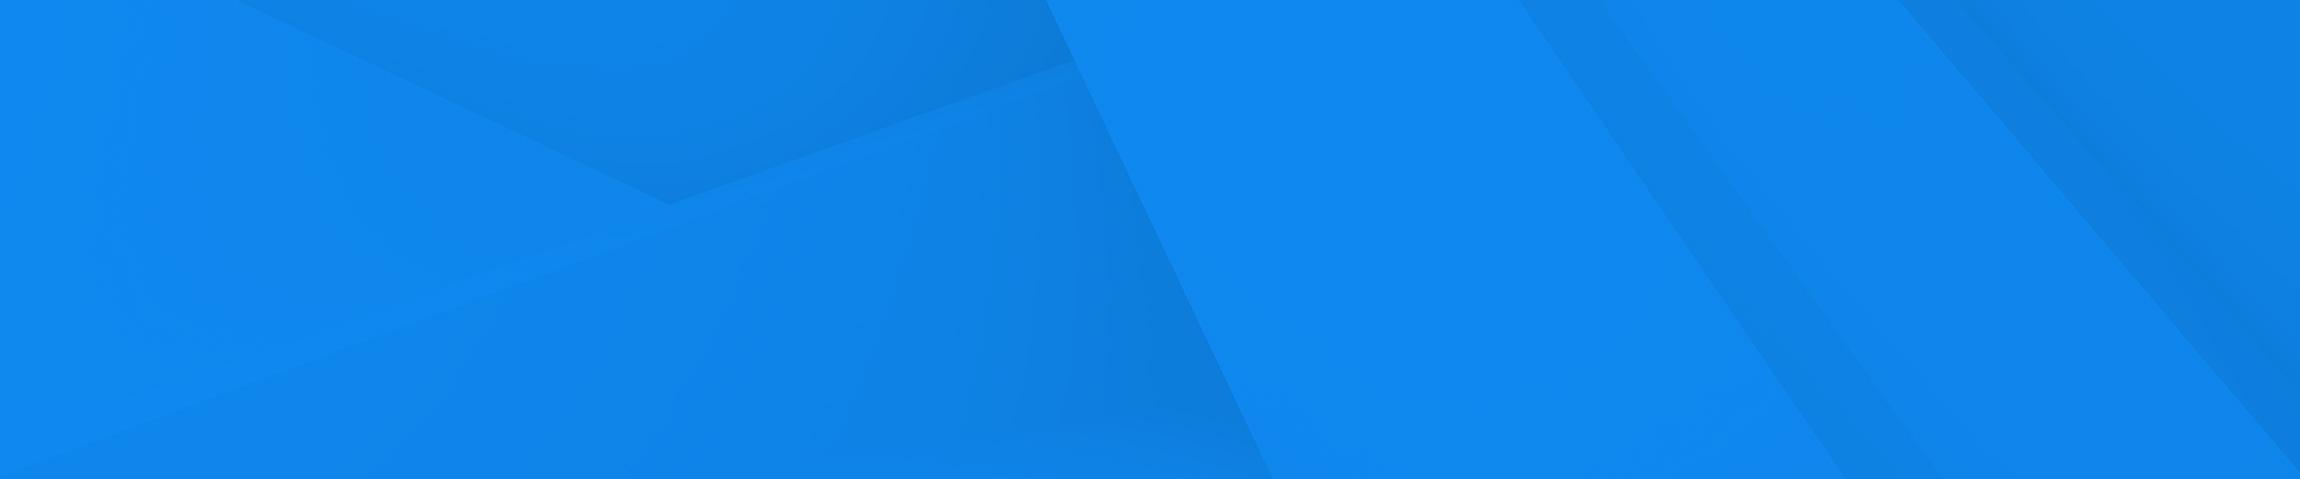 Custom Website Design Background